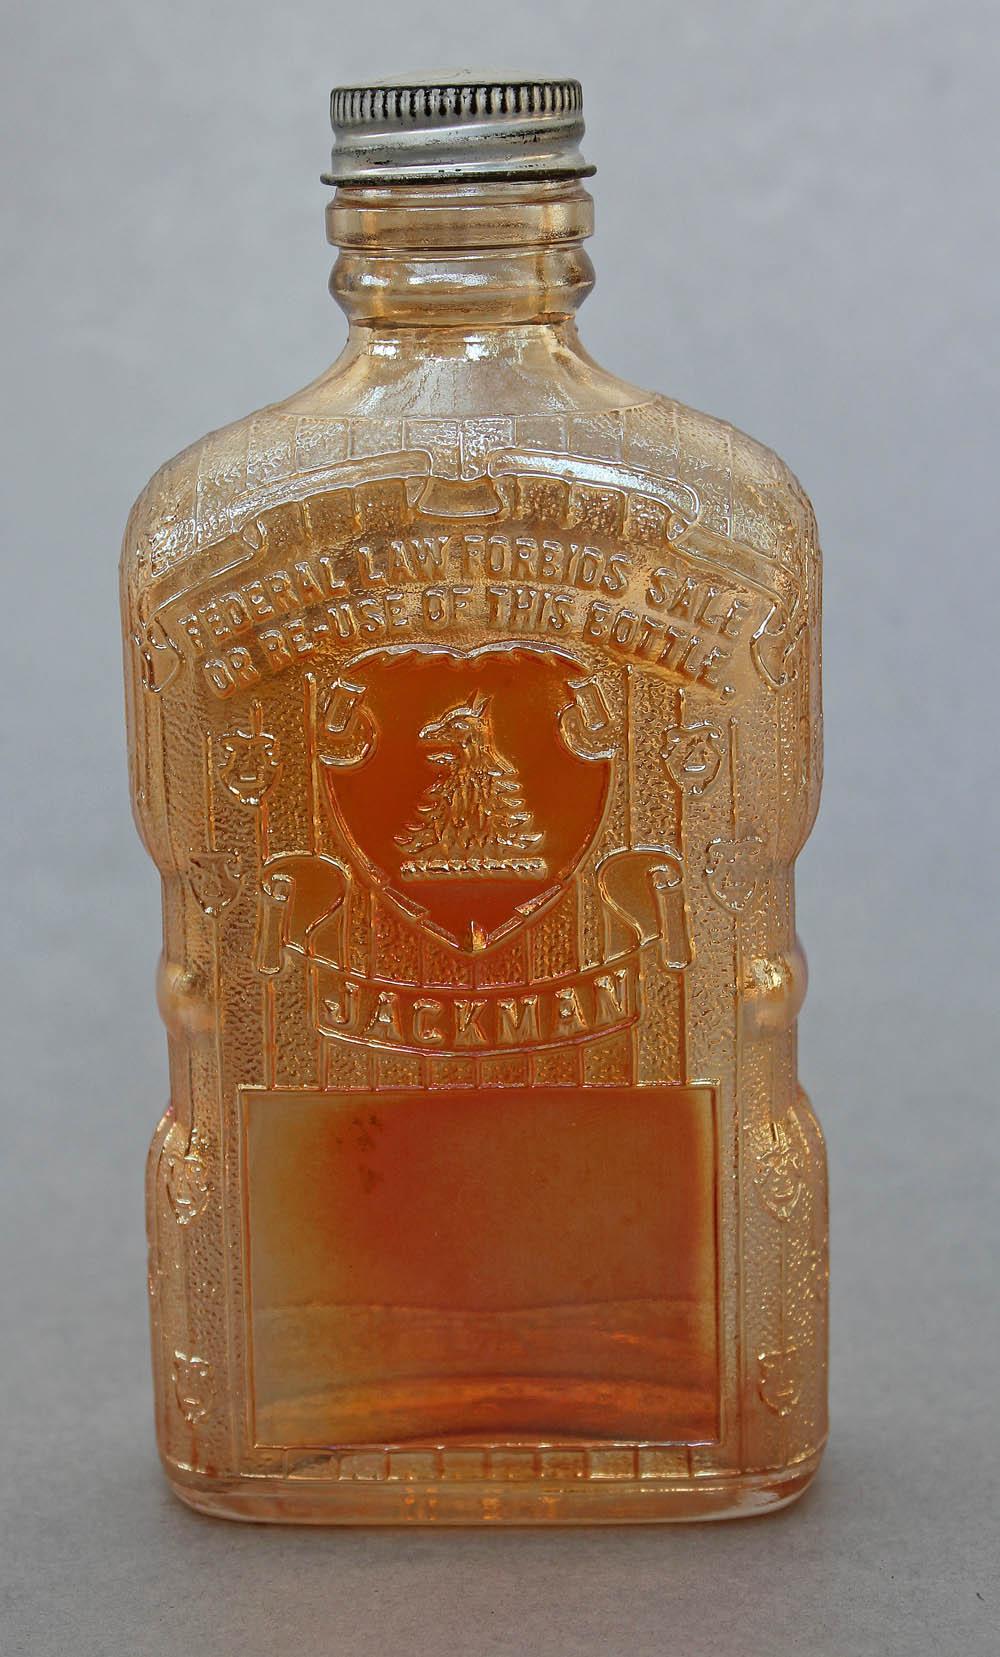 Jackman Whisky Bottle, maker wt ?